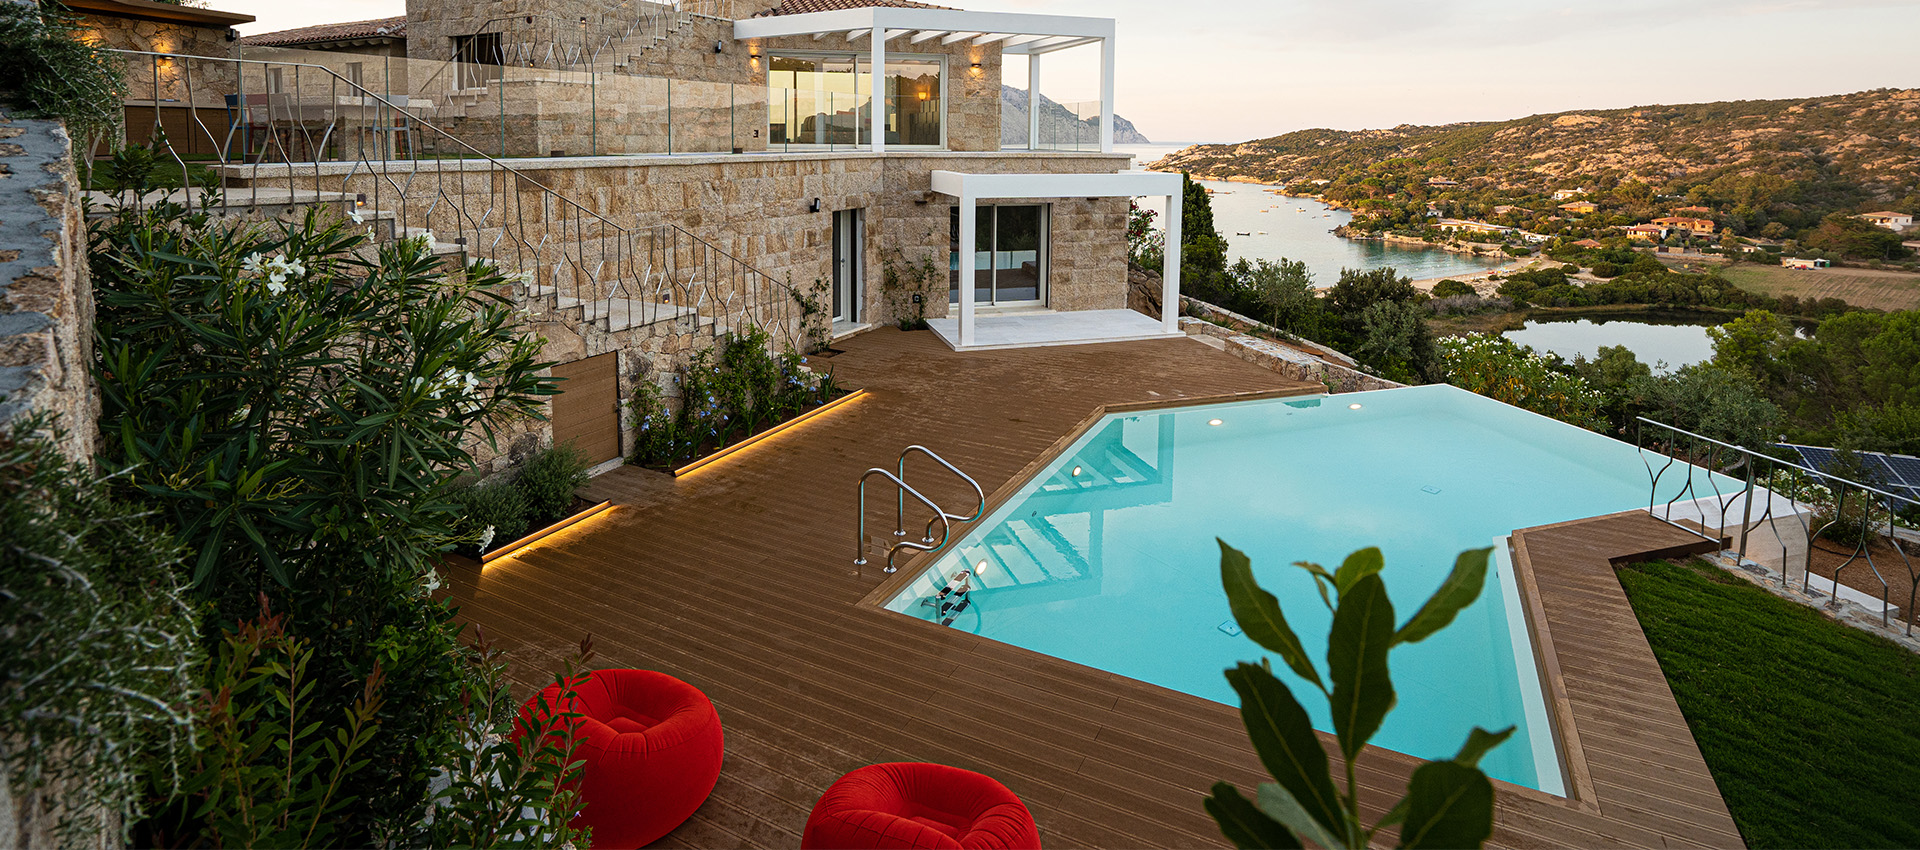 http://dakotaliving.eu/wp-content/uploads/2020/01/Sardegna.jpg